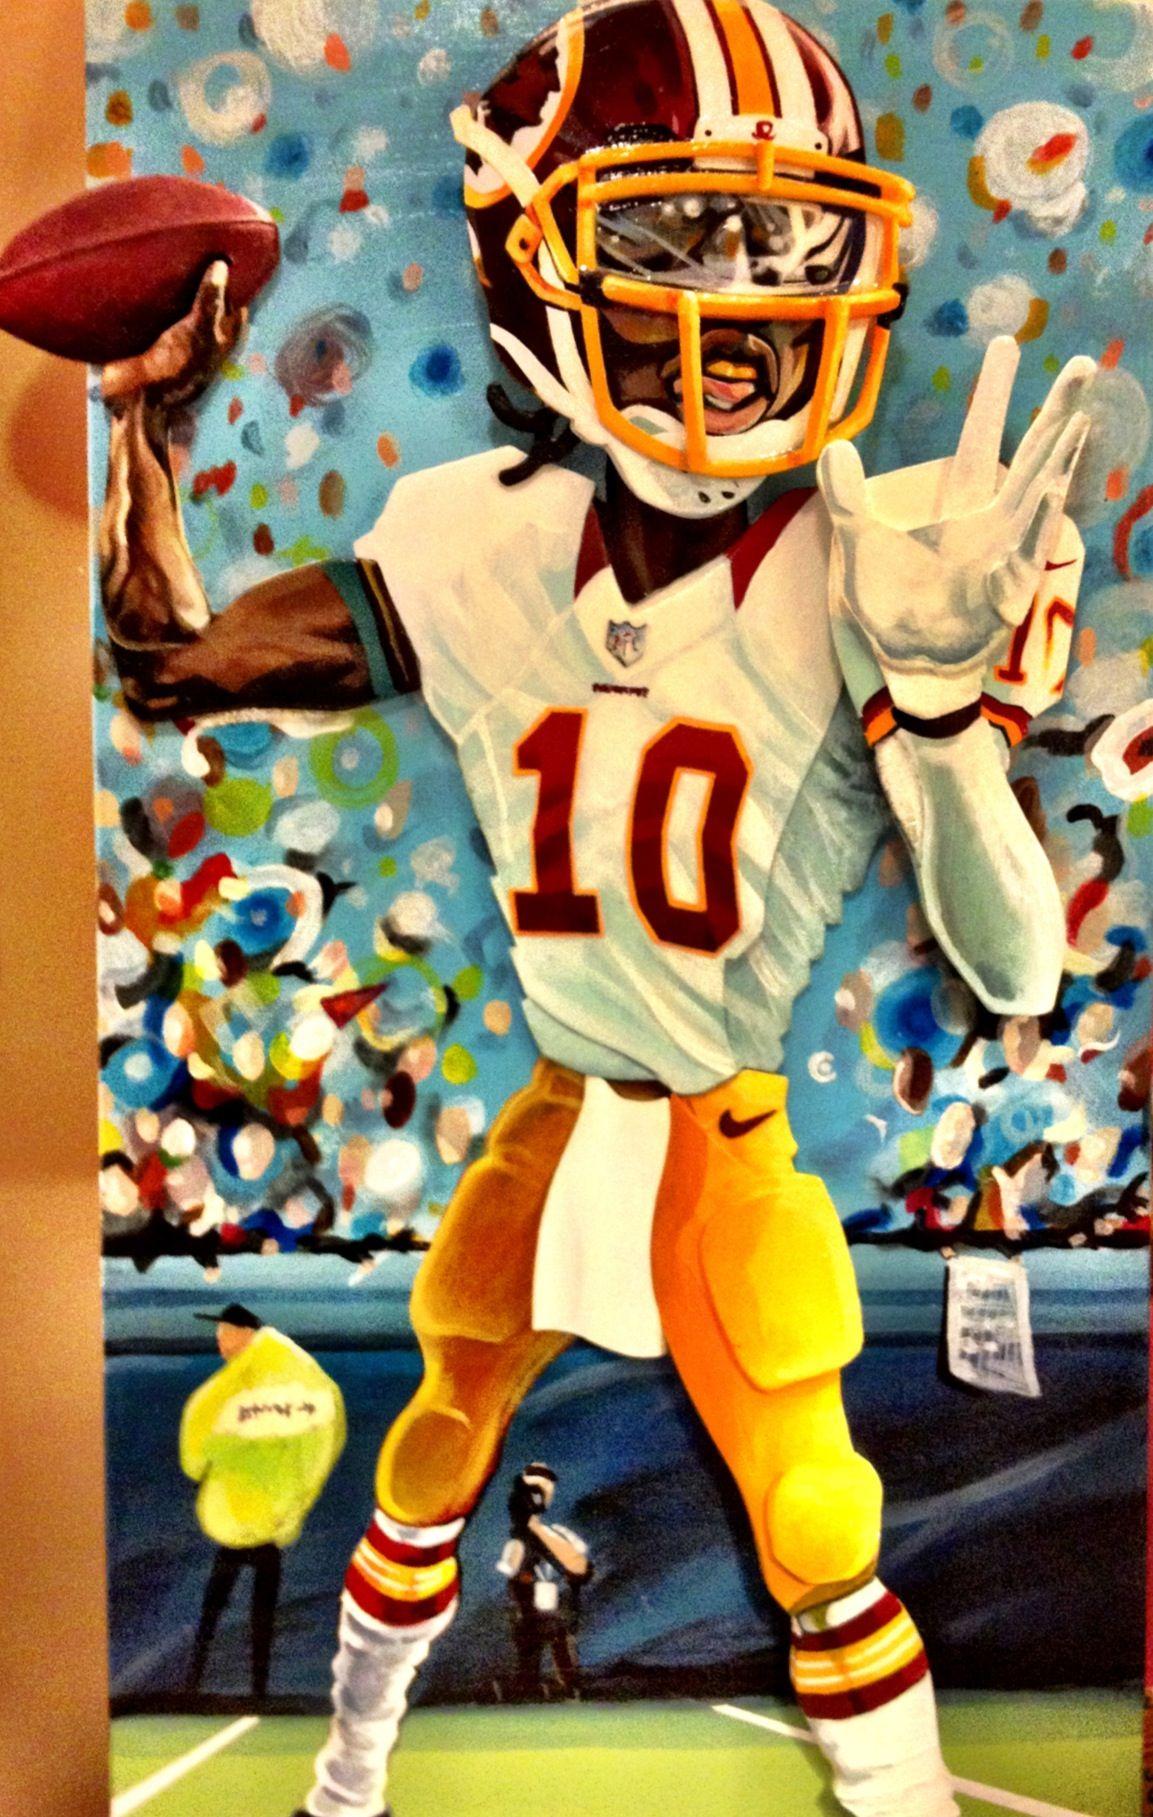 Pop-Pop Art - #RG3, #Redskins | Redskins Art | Pinterest | Pop pop ...